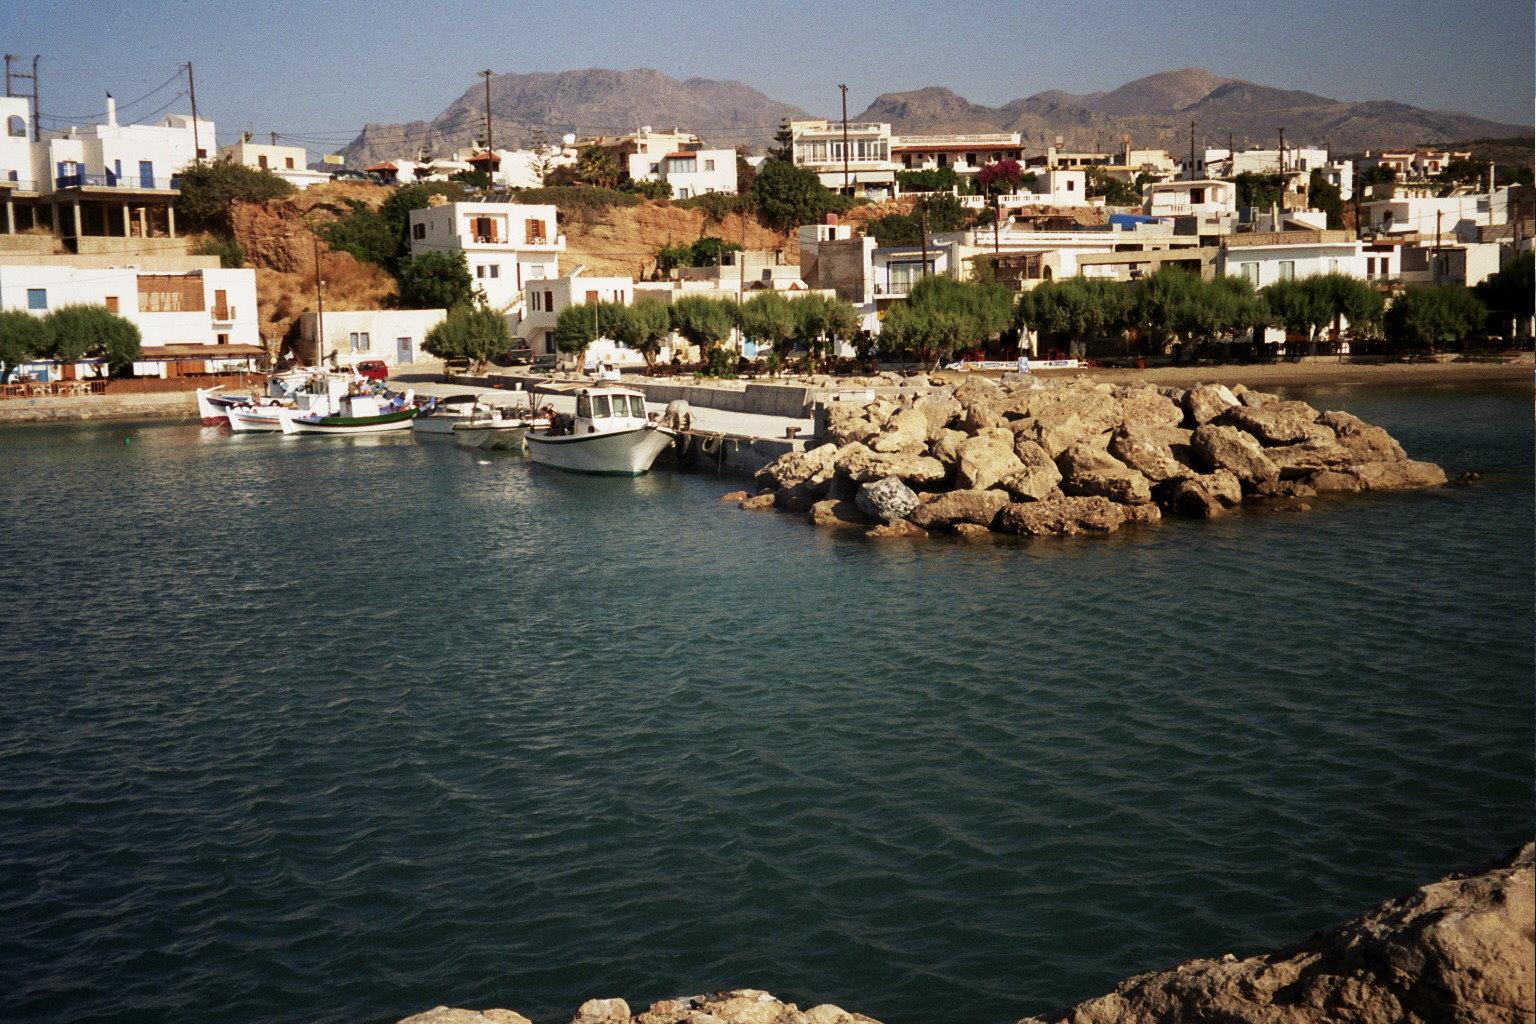 Makrigialos Greece  City pictures : Makrigialos, Sitia Crete Greece